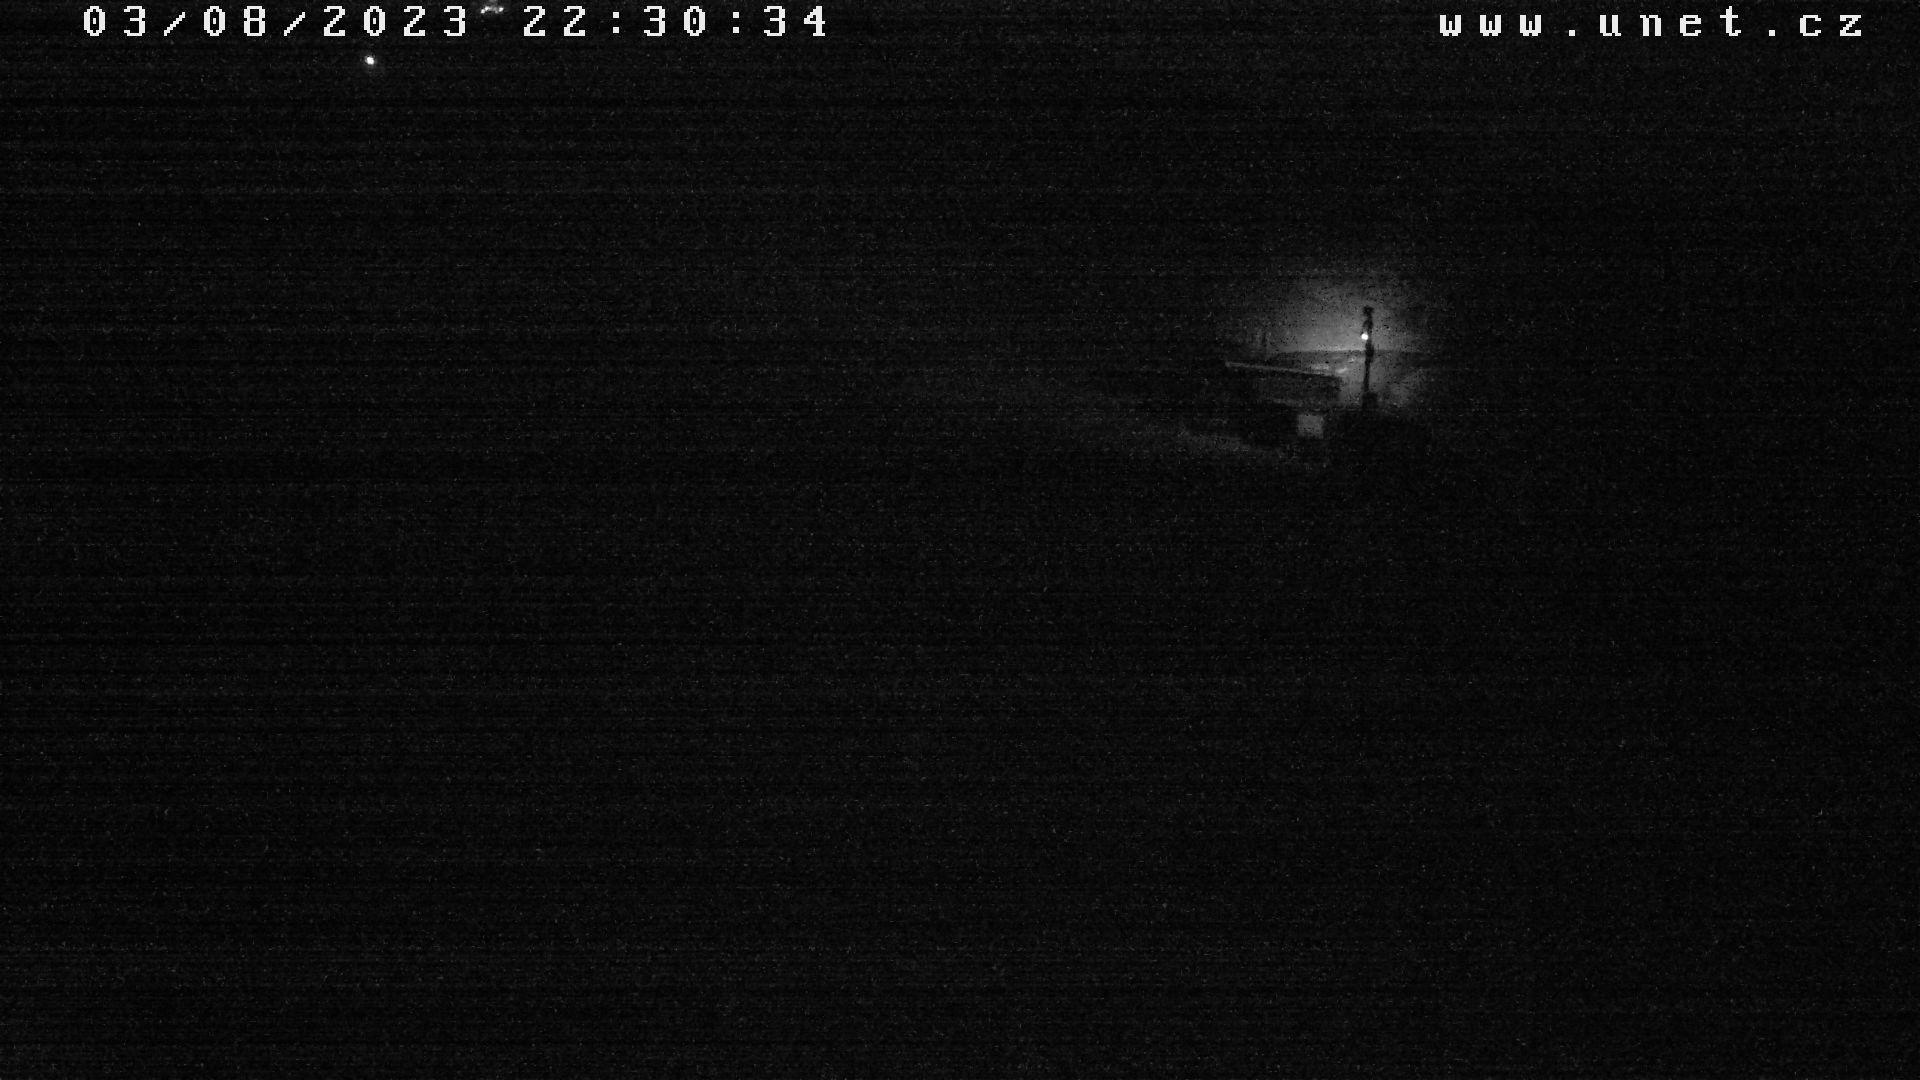 Online videokamera SKI SNOW PARK HARUSŮV KOPEC